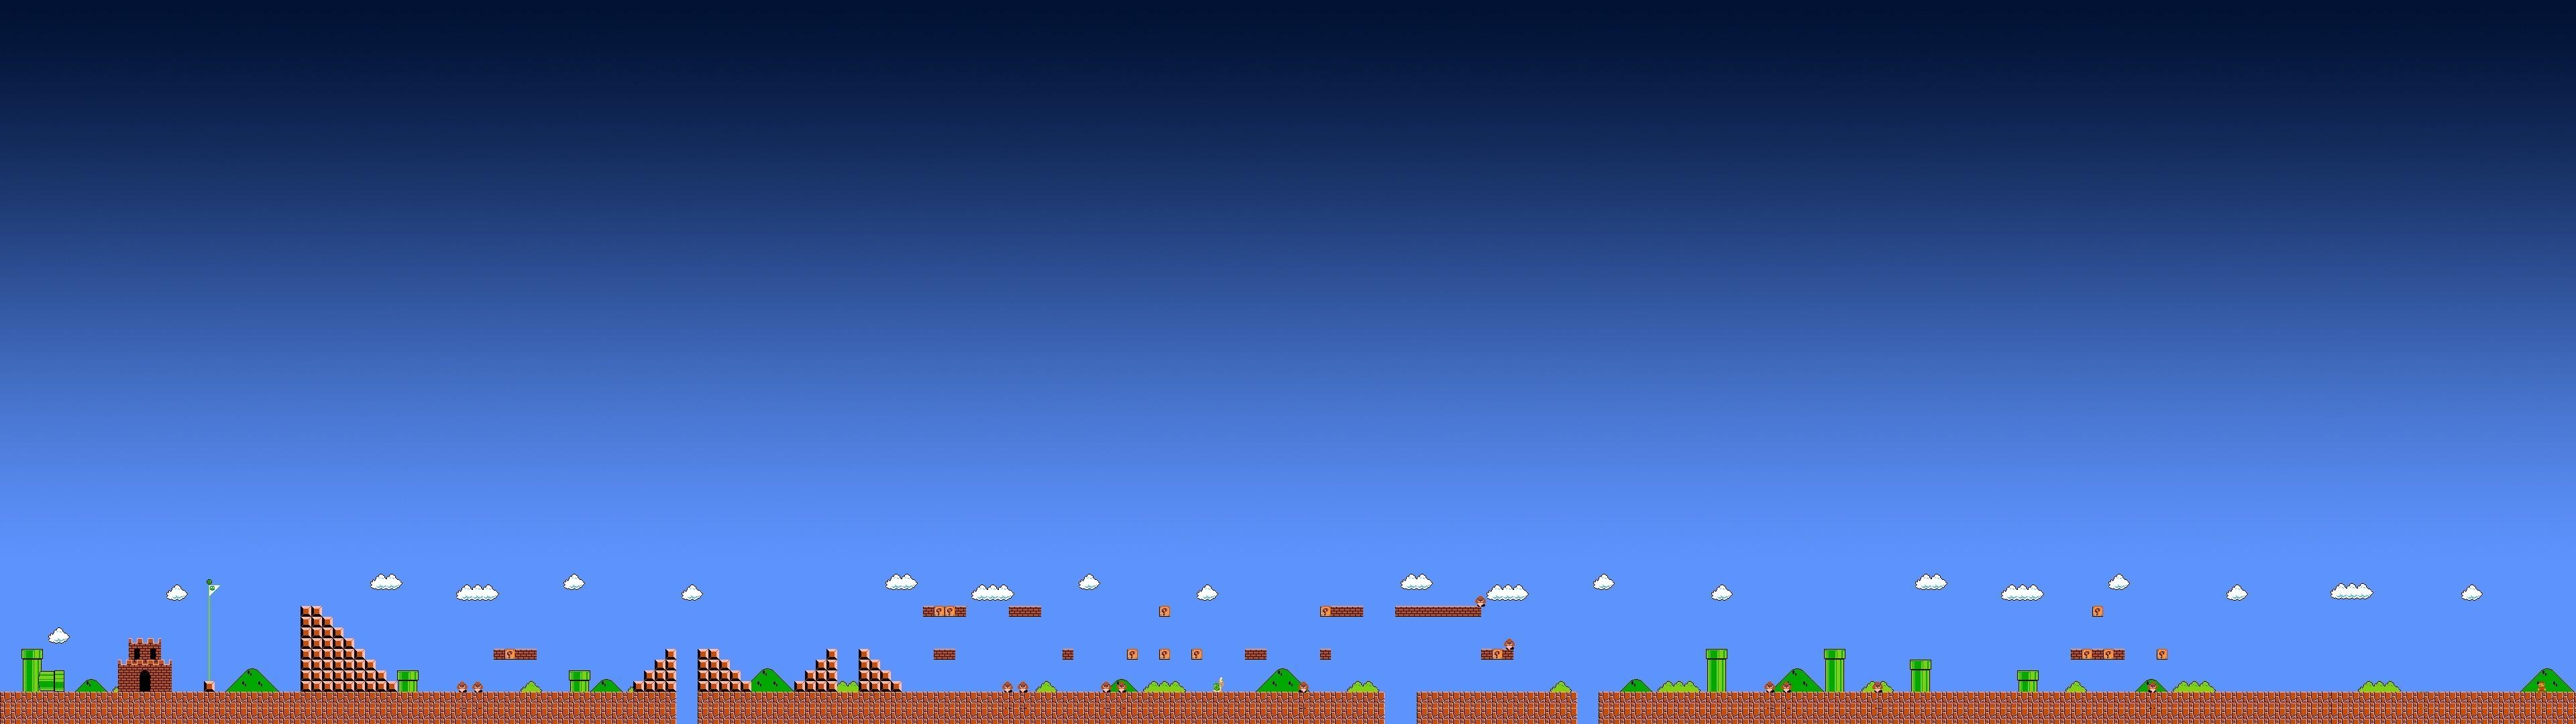 Super Mario, Video Games, Arcade, Pixels, Triple Screen Wallpapers HD /  Desktop and Mobile Backgrounds